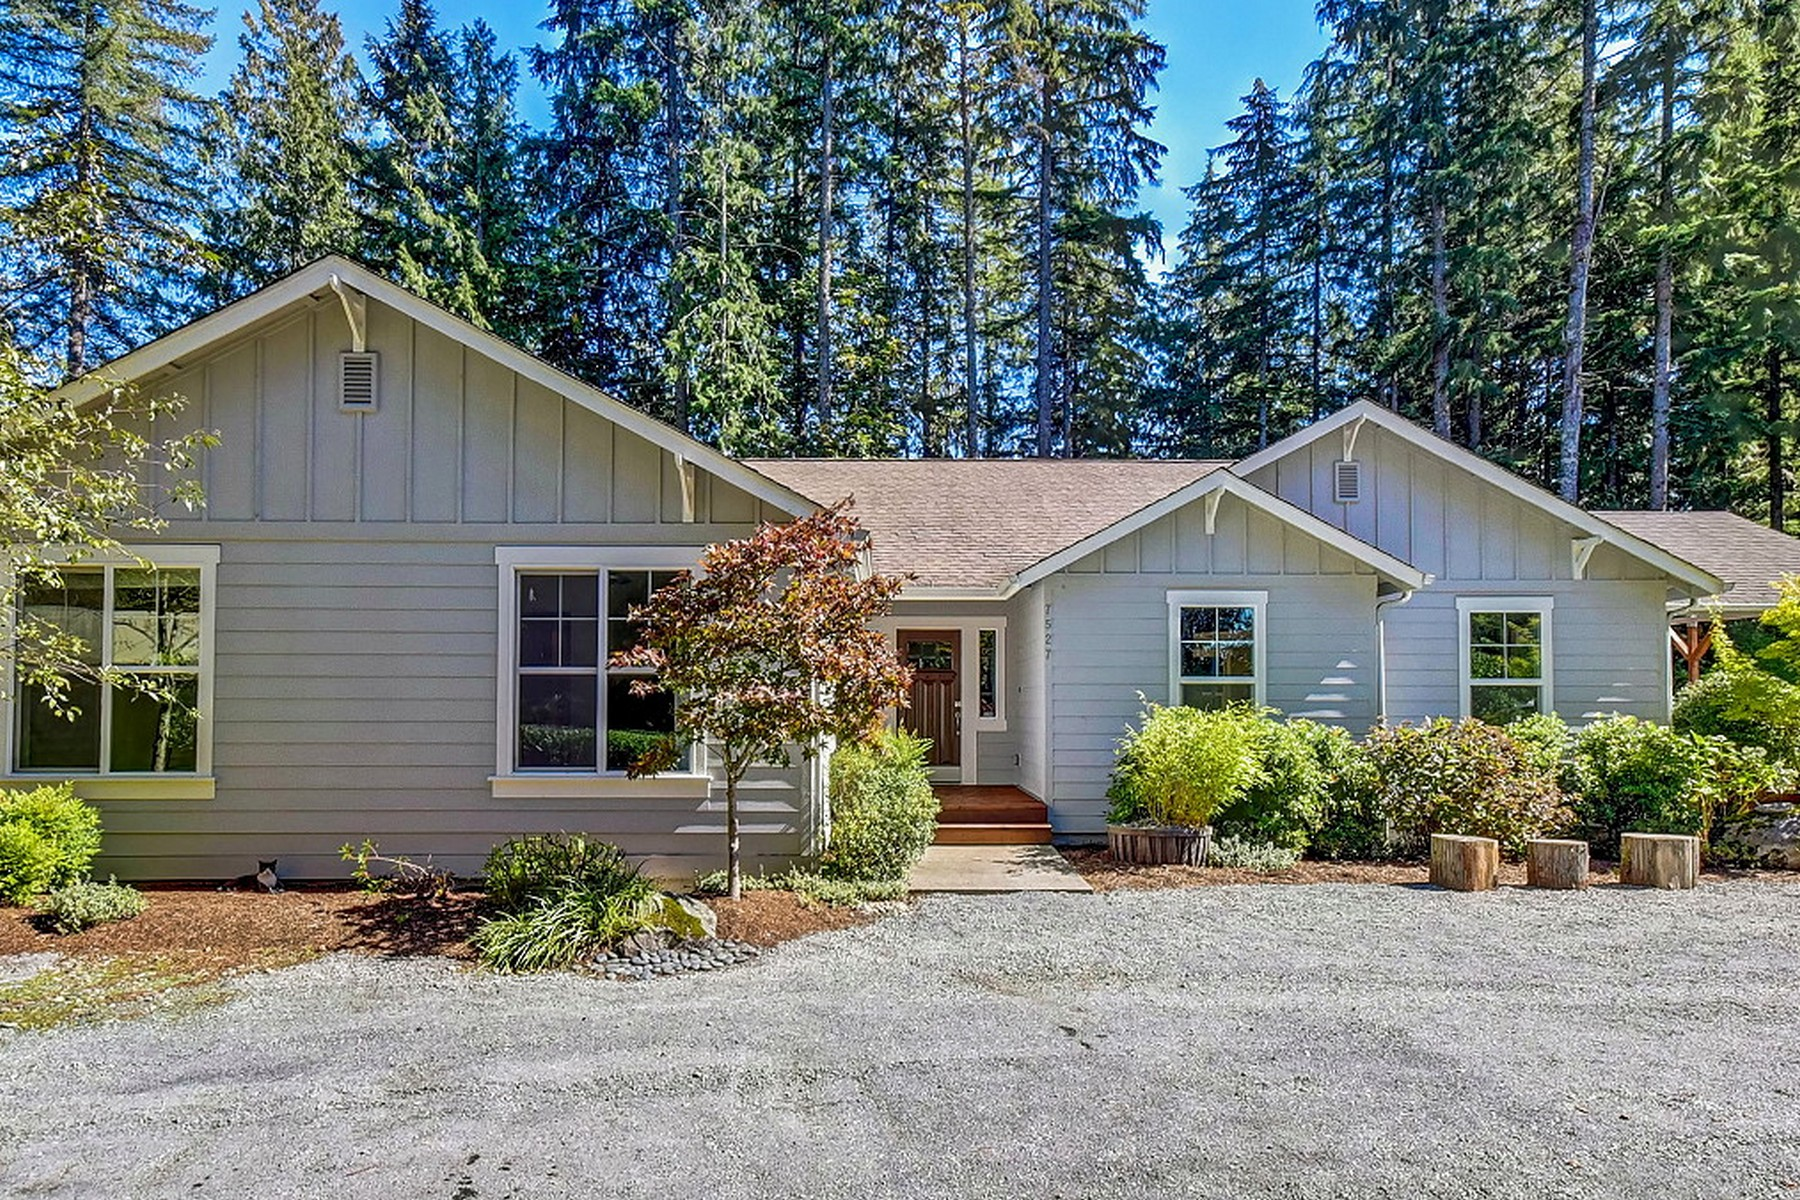 Casa para uma família para Venda às Desirable Monroe Home 7527 Woods Creek RD Monroe, Washington, 98272 Estados Unidos